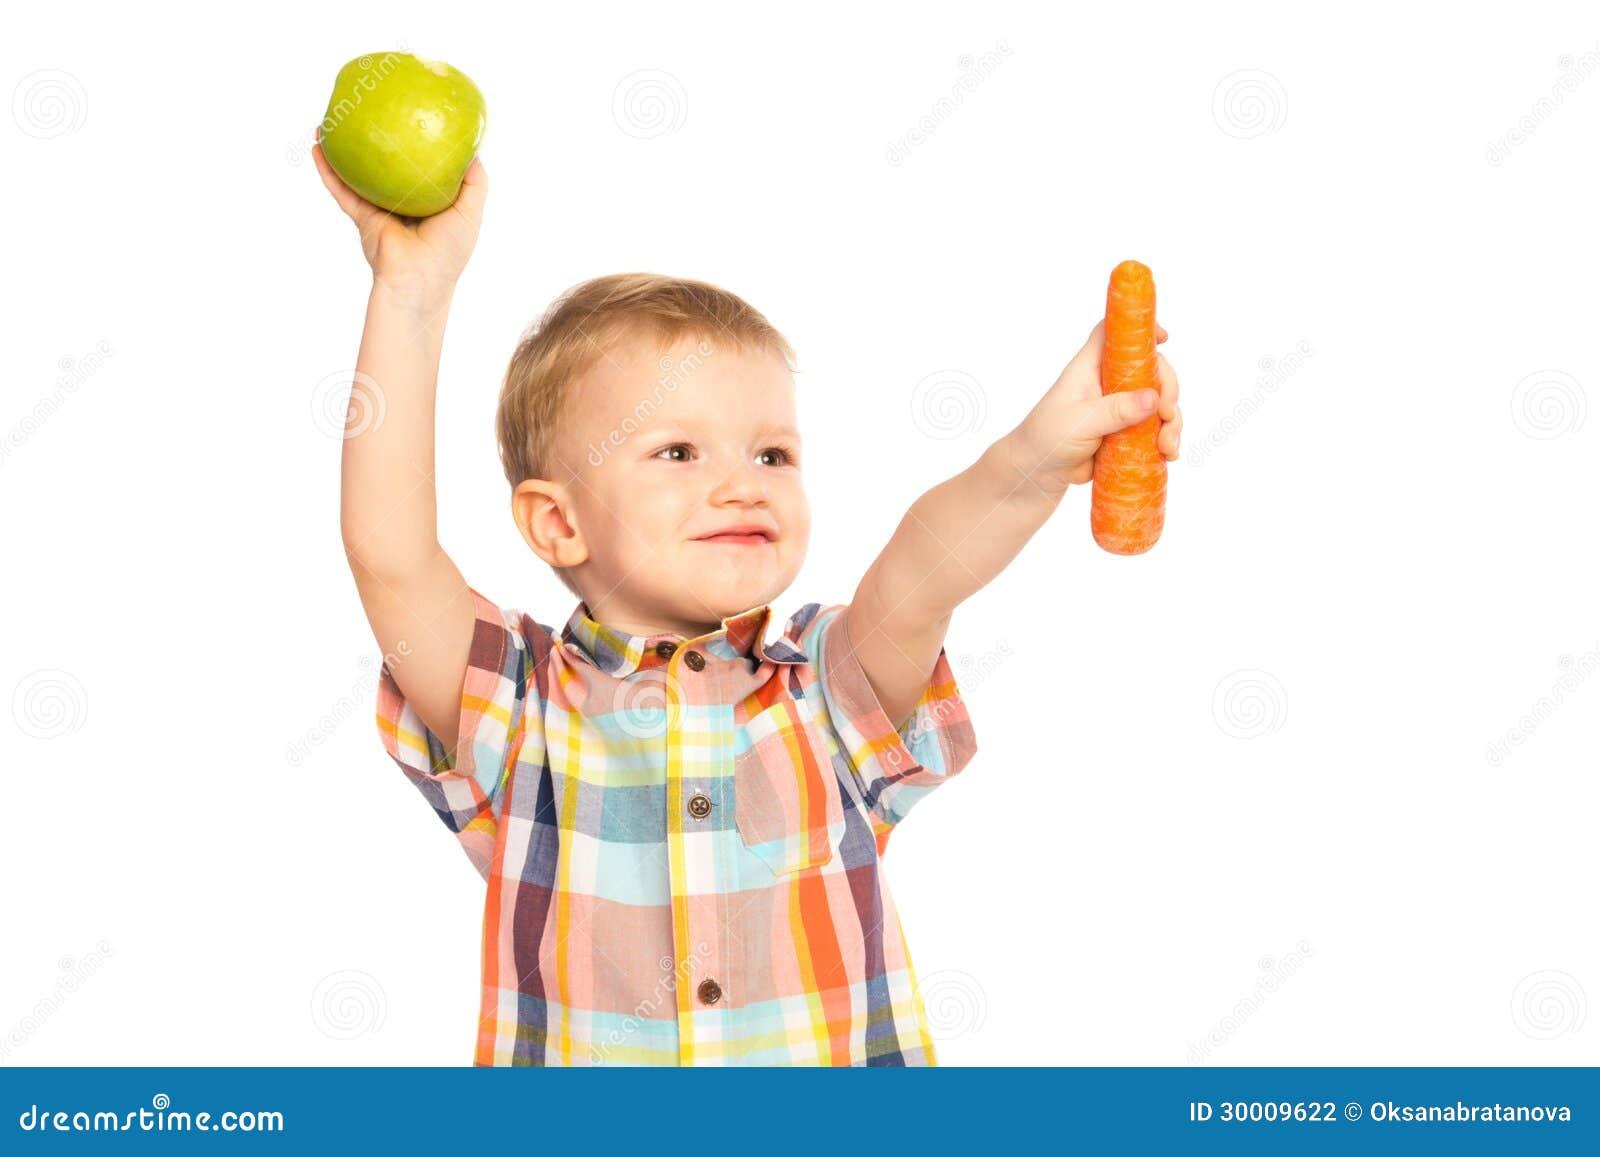 Child Eating Cake Images